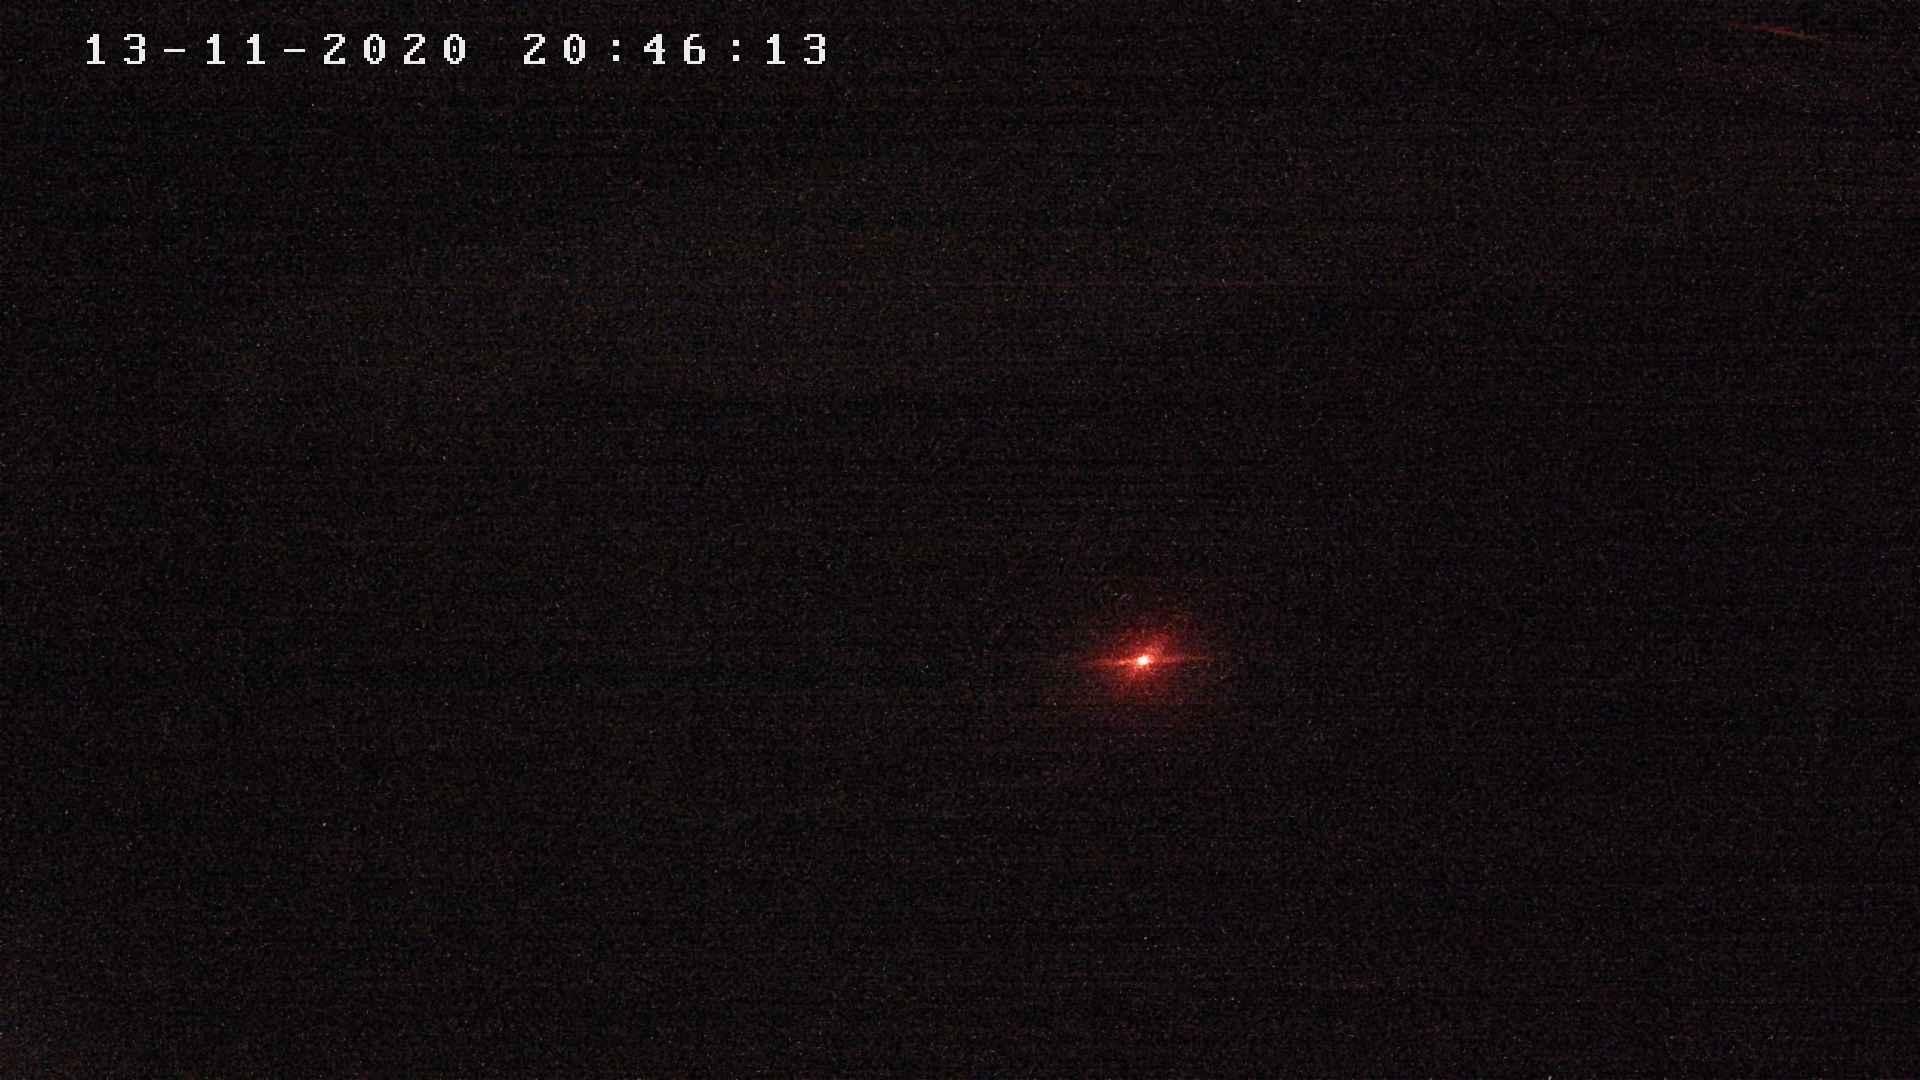 Webcam Monte Verena partenza impianti sciistici 1650 m Slm